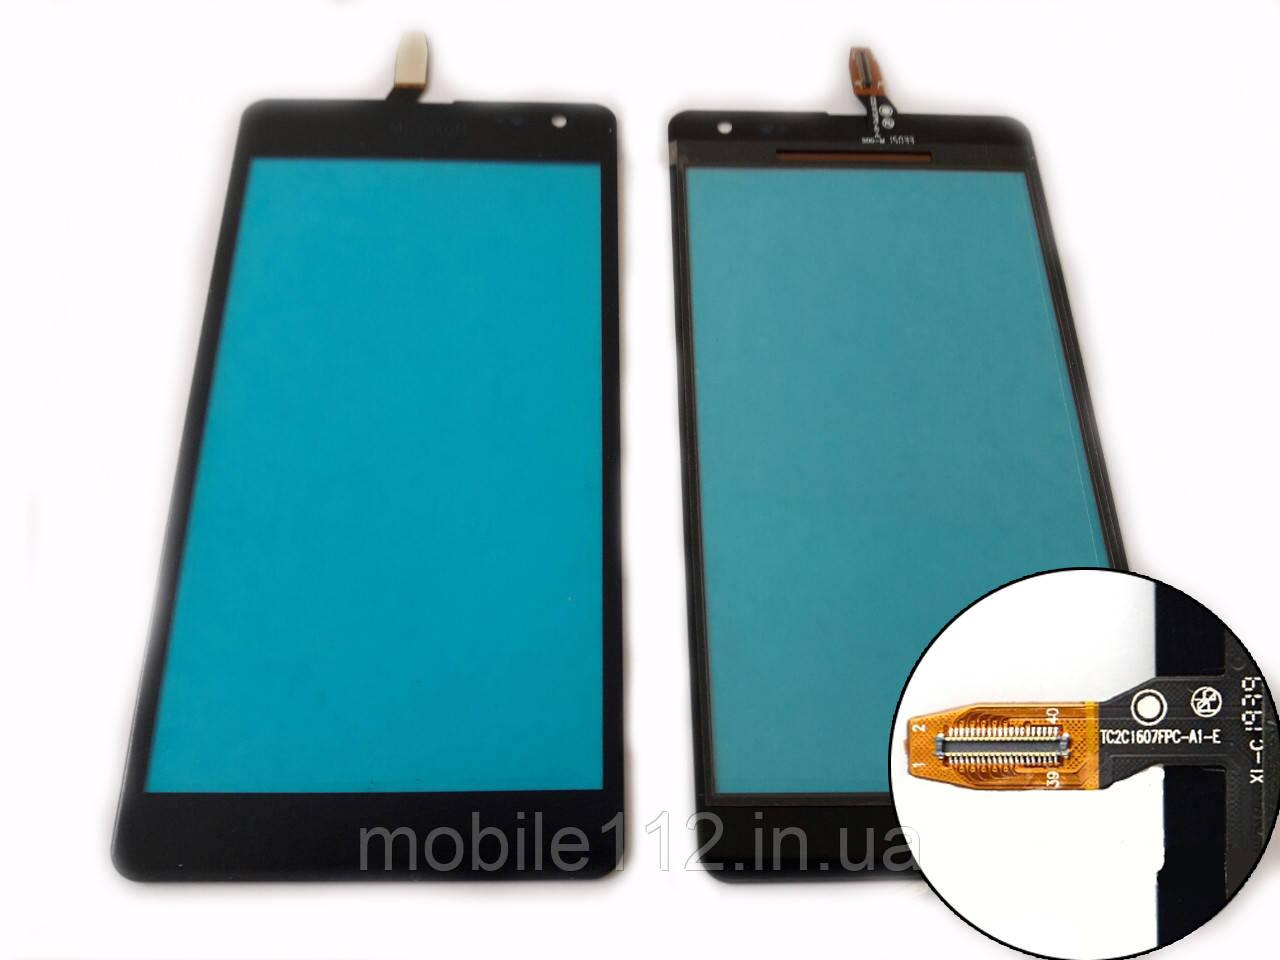 Тачскрин для Microsoft 535 Lumia Dual Sim (CT2C1607FPC-A1-E), чёрный, оригинал (Китай)